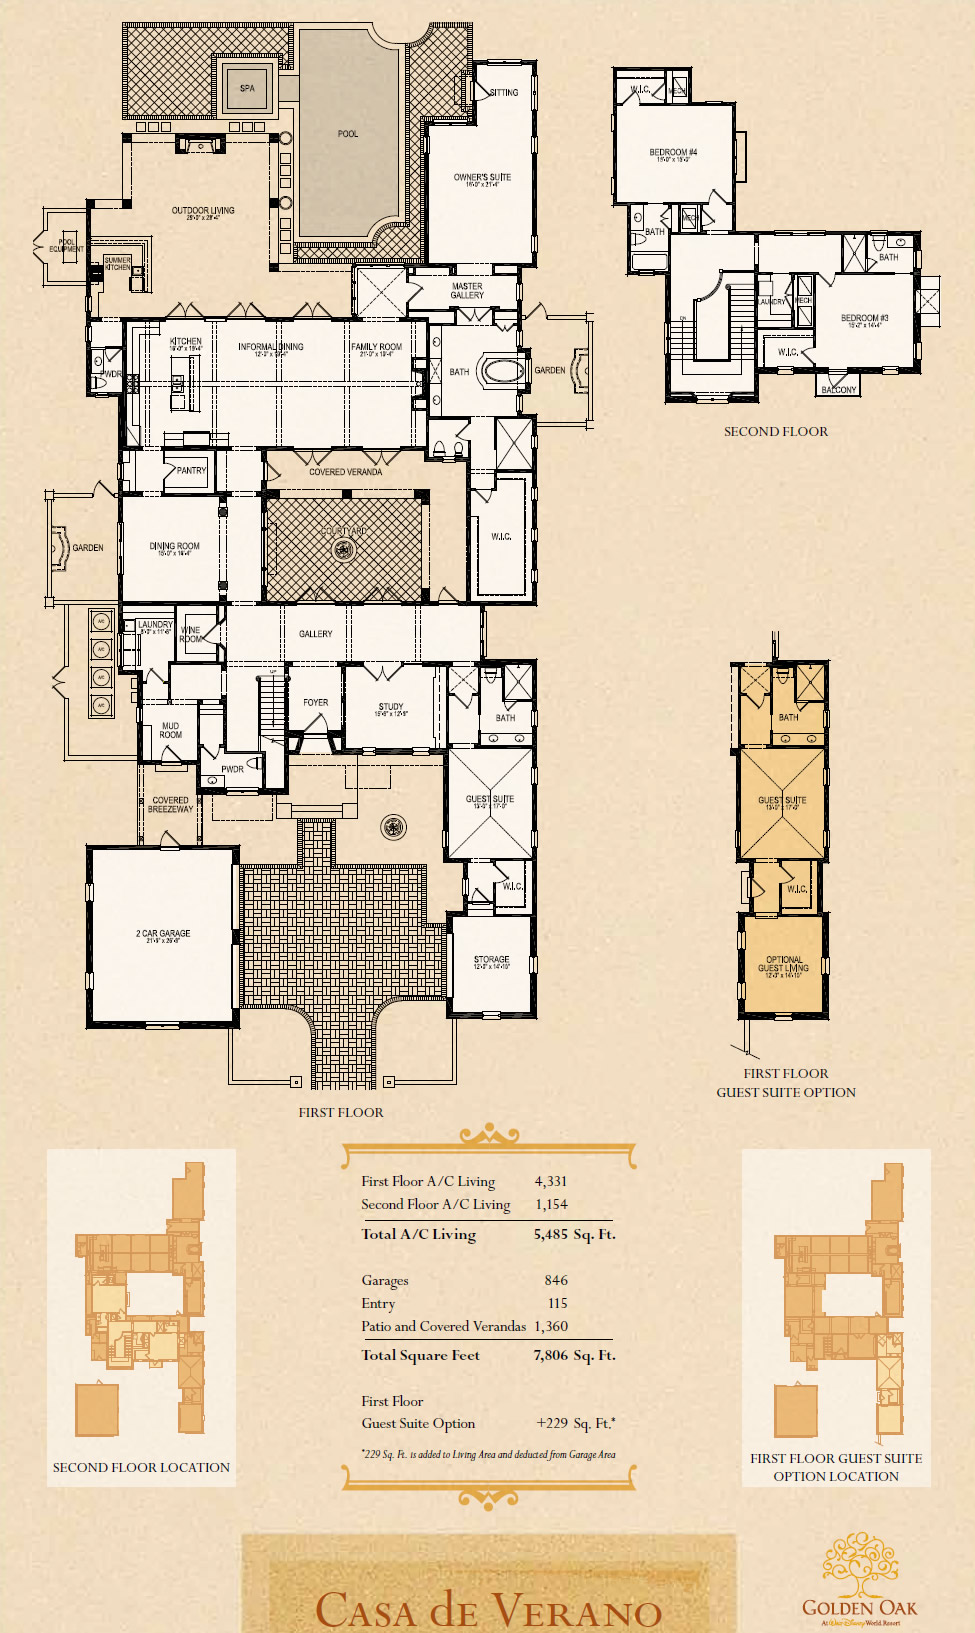 Disney Golden Oak Luxury new homes in Lake Buena VistaNew